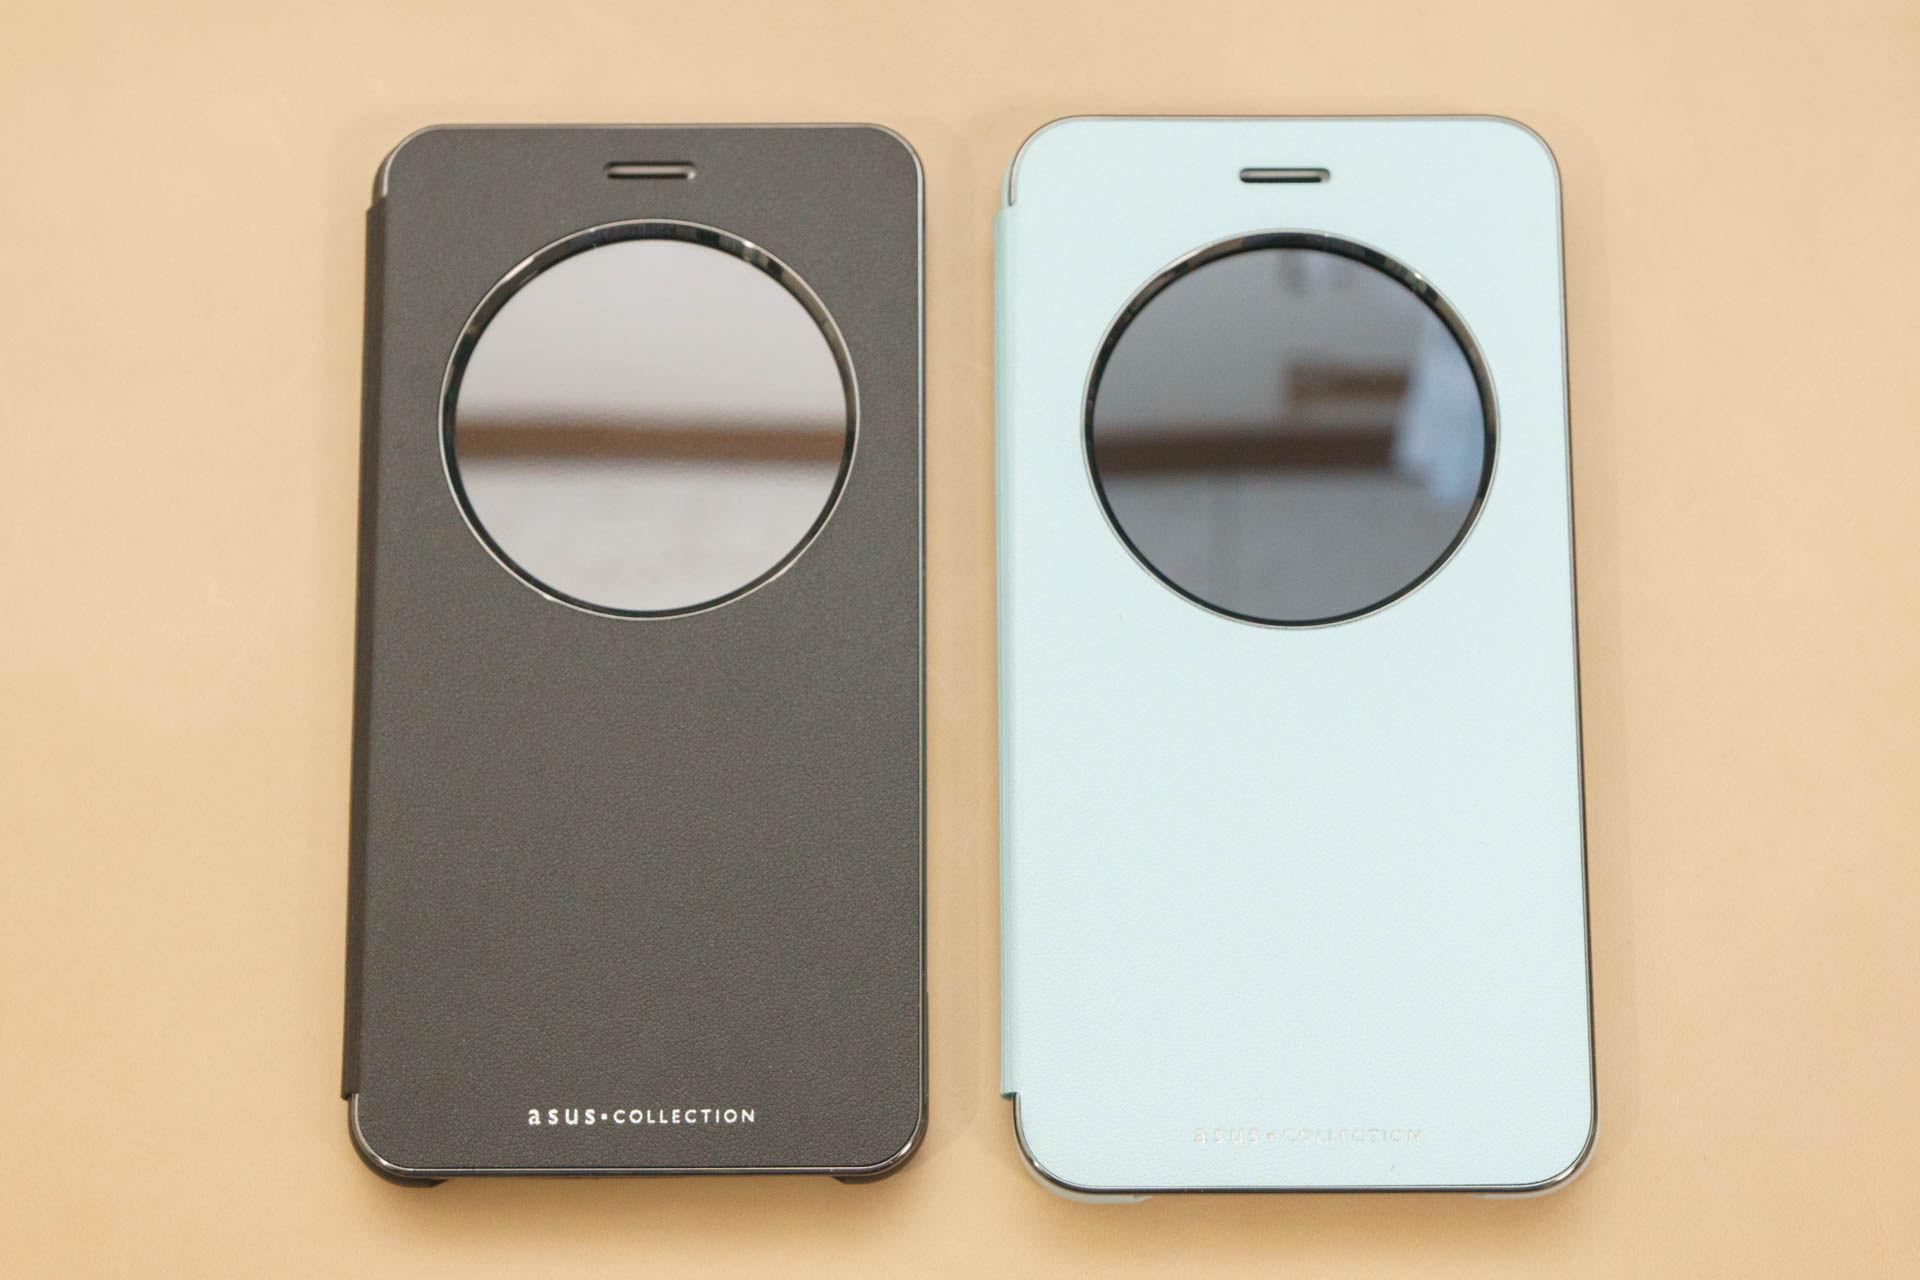 big sale 07d3c 53e77 純正View Flip CoverでZenFone 3シリーズをもっと便利に使おう : ASUS ...